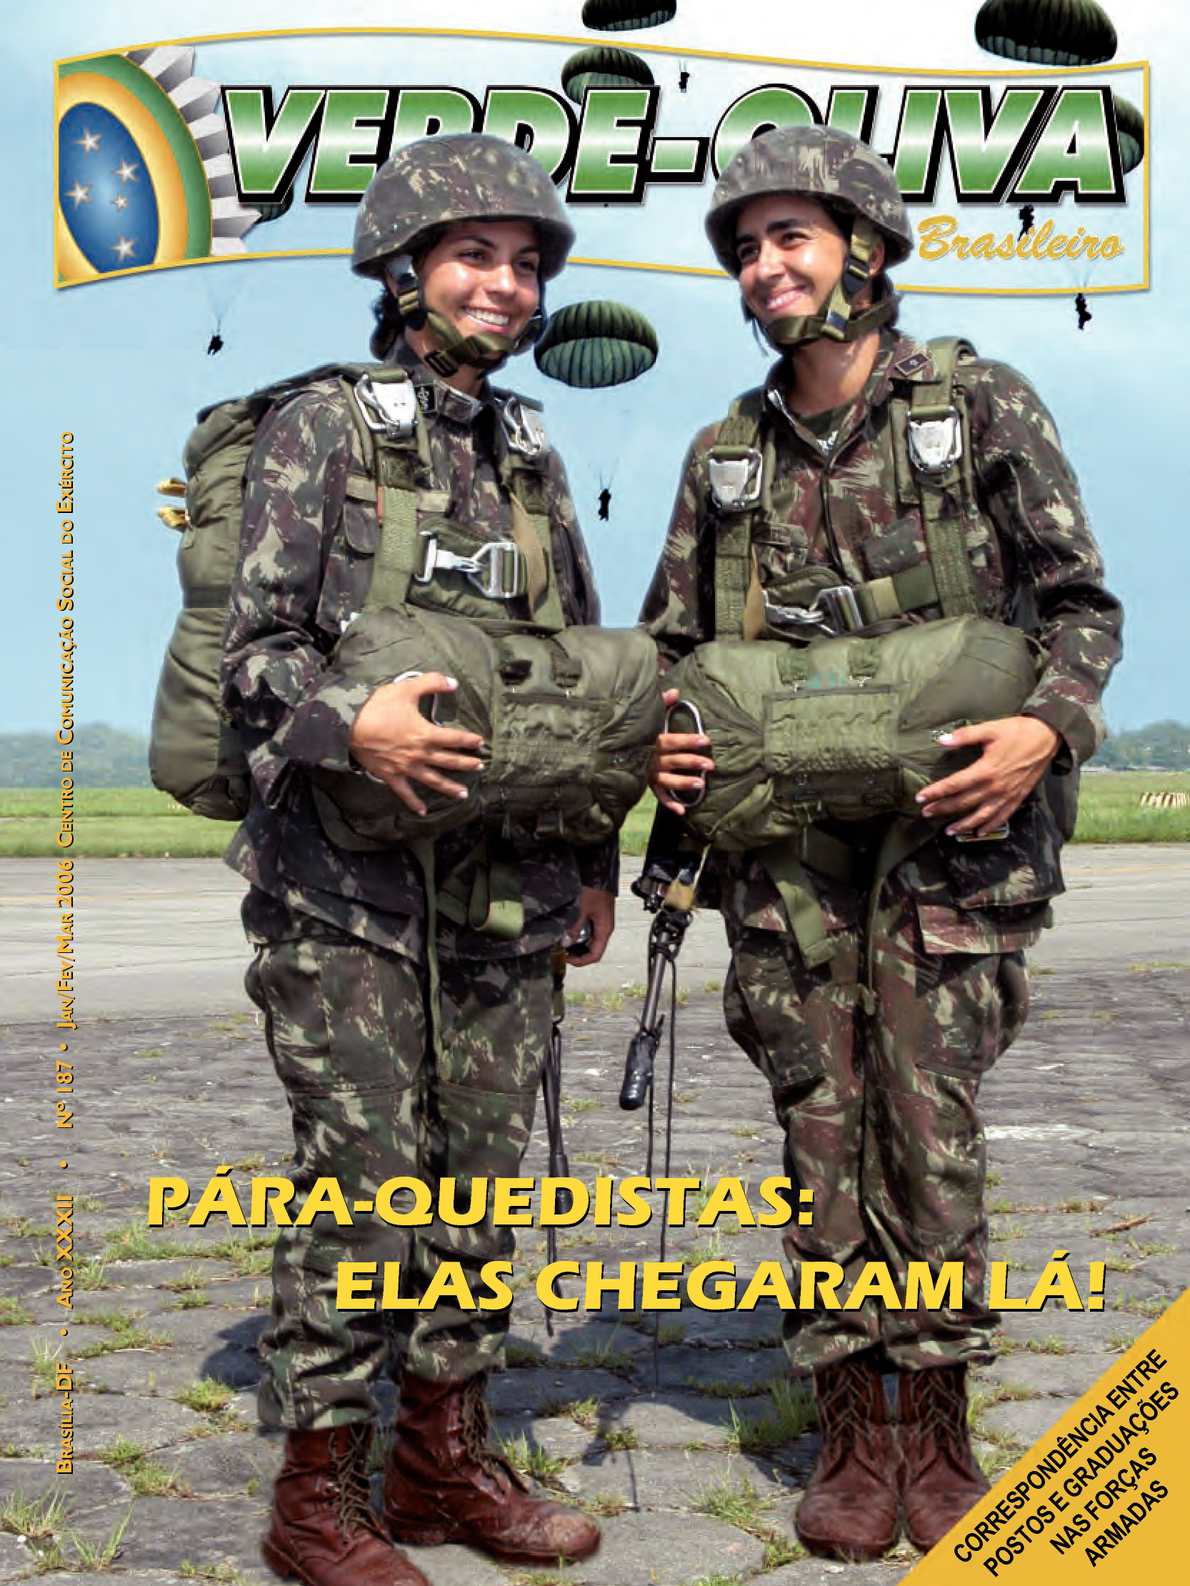 Calaméo - Revista Verde-Oliva Nº 187 7b02be6076d